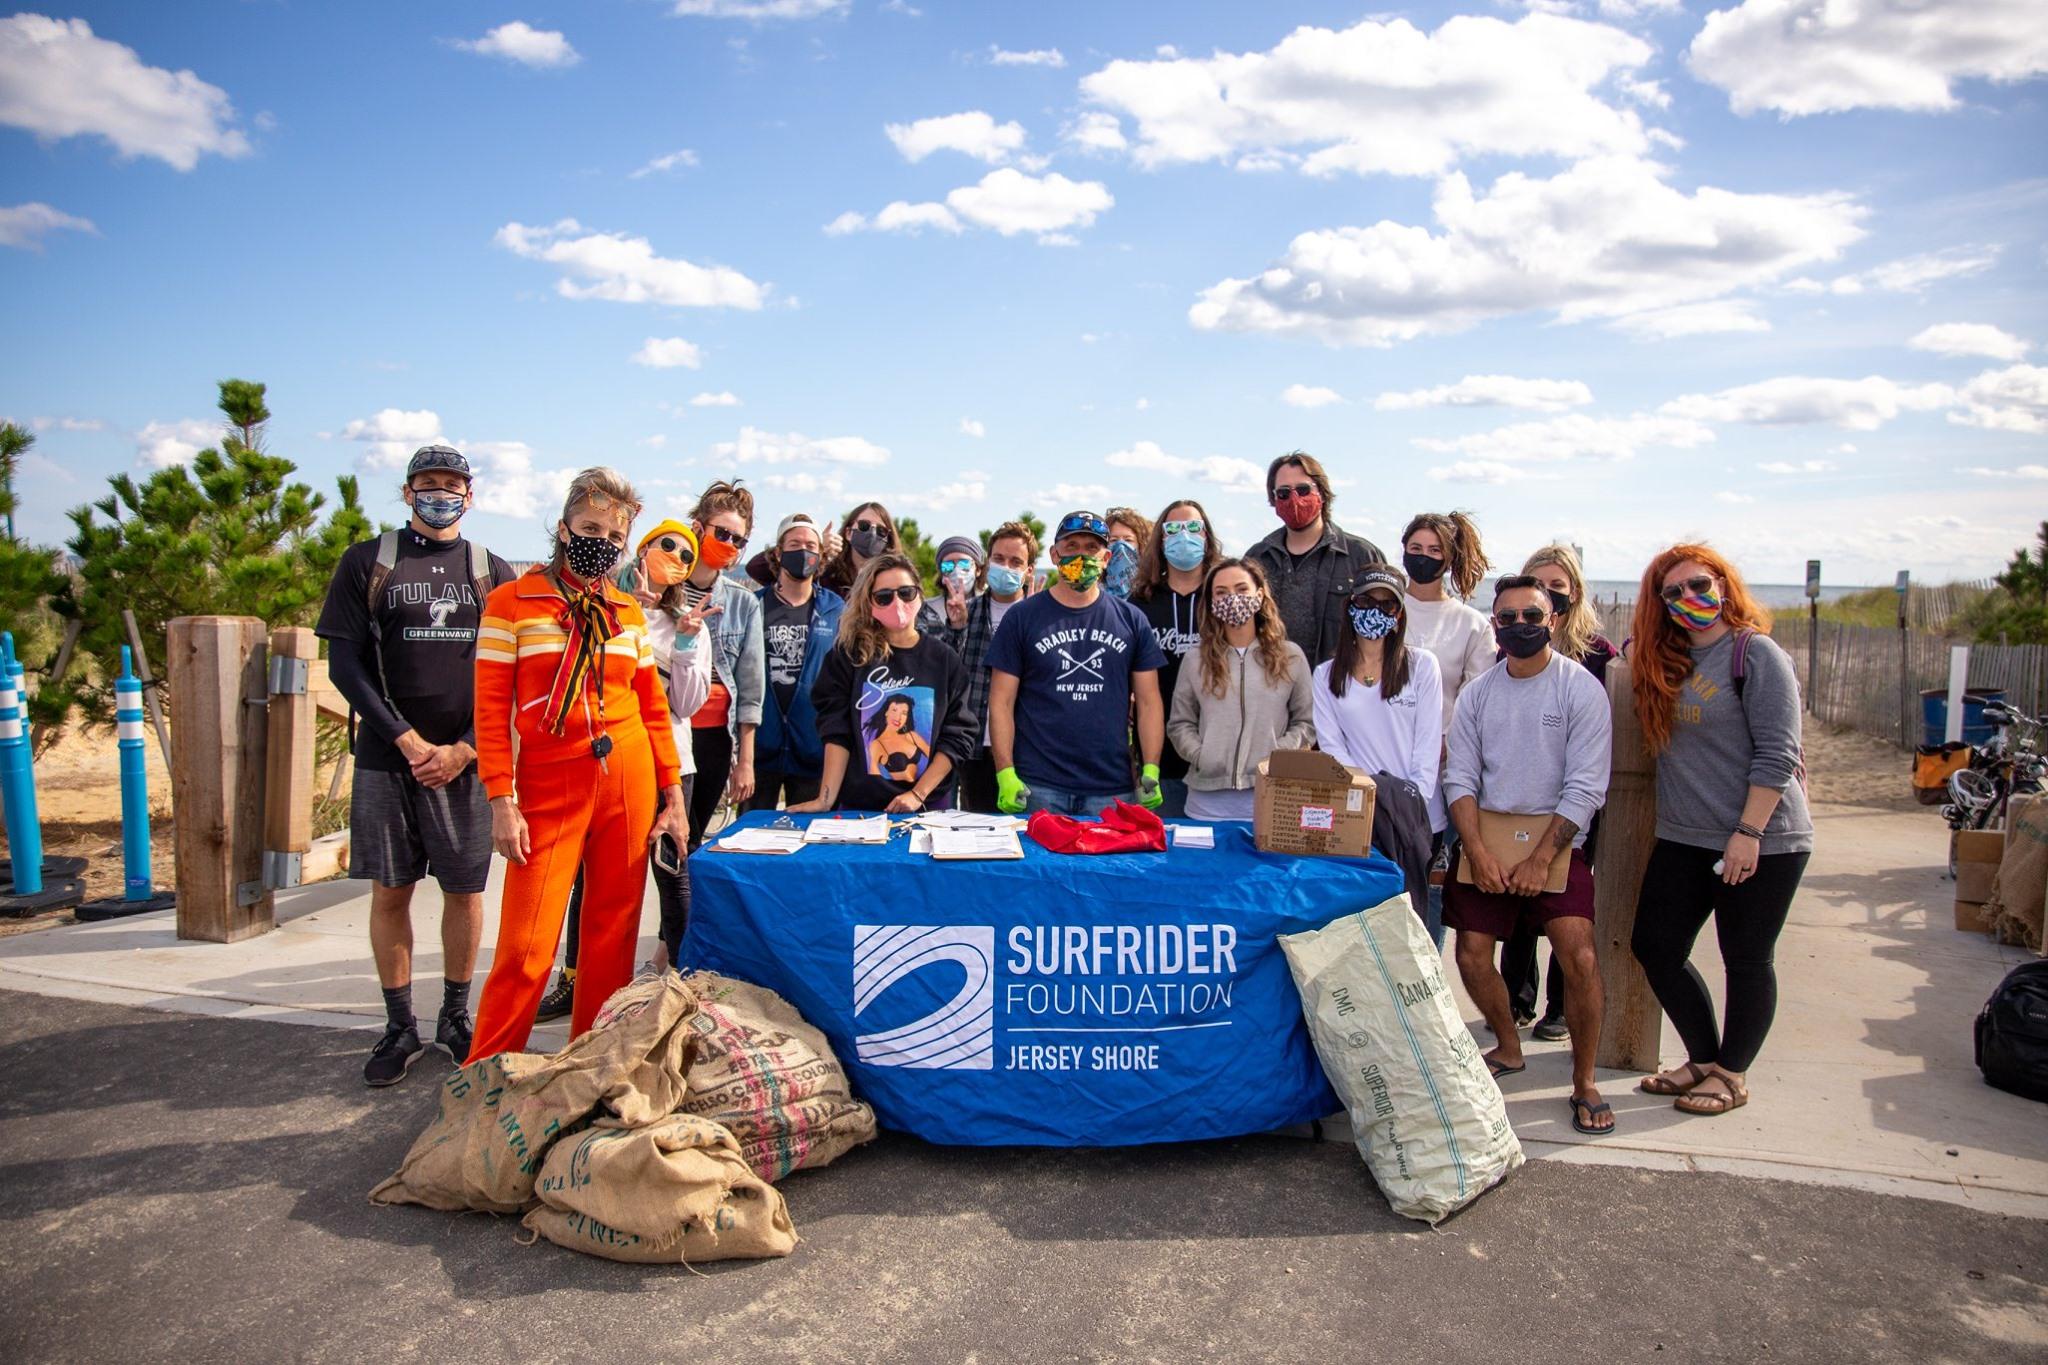 Member Feature: Surfrider Foundation